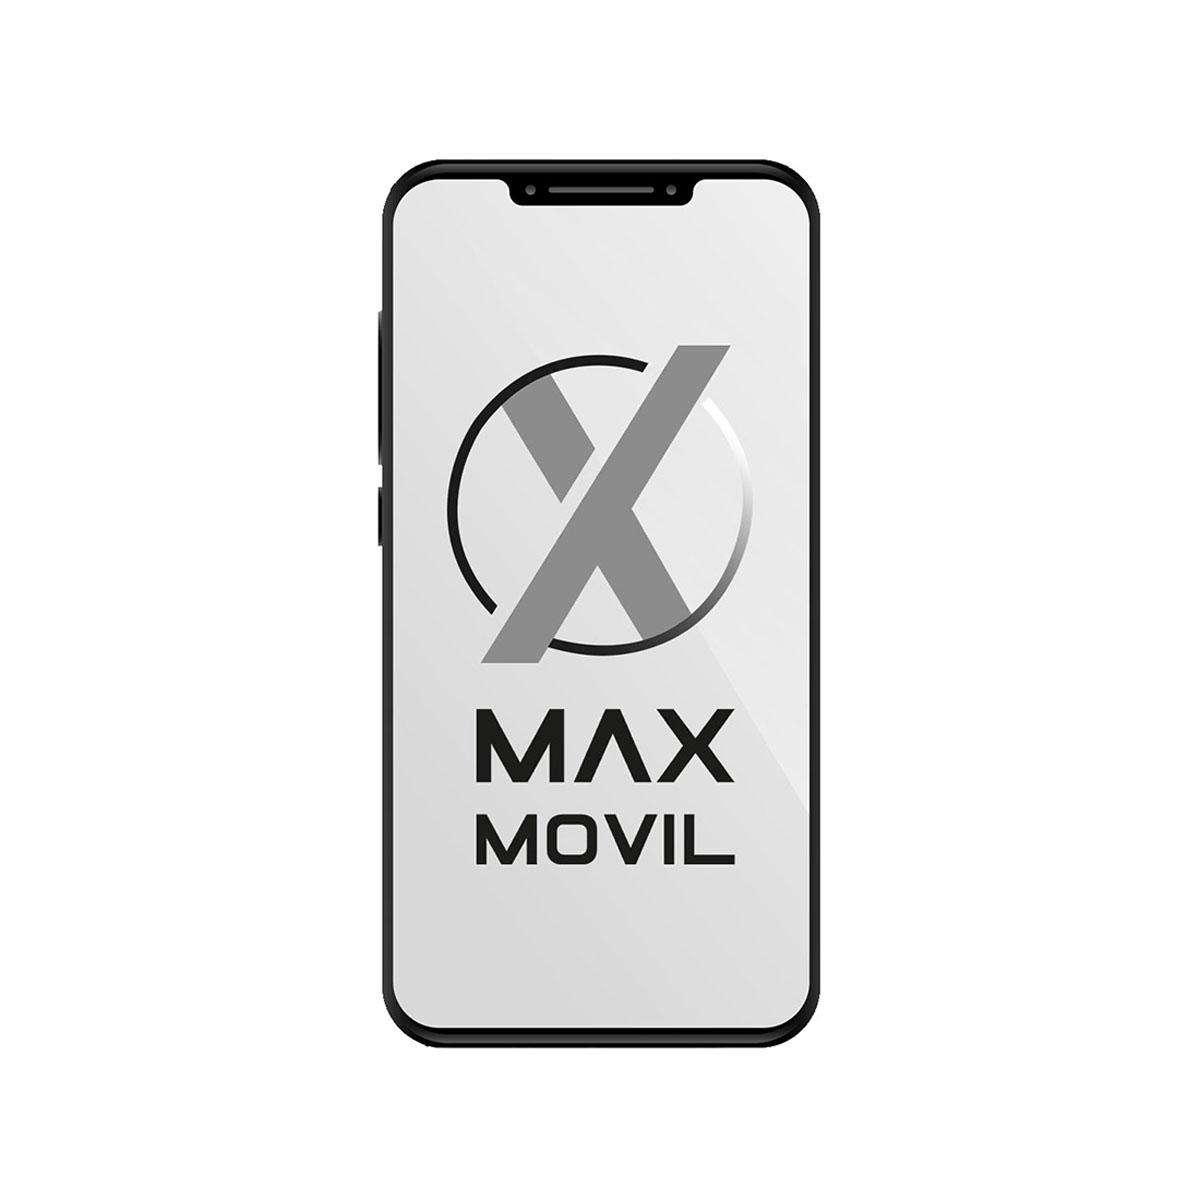 iPad 10,2 (2019) WIFI 32GB Plata (Silver) MW752TY/A